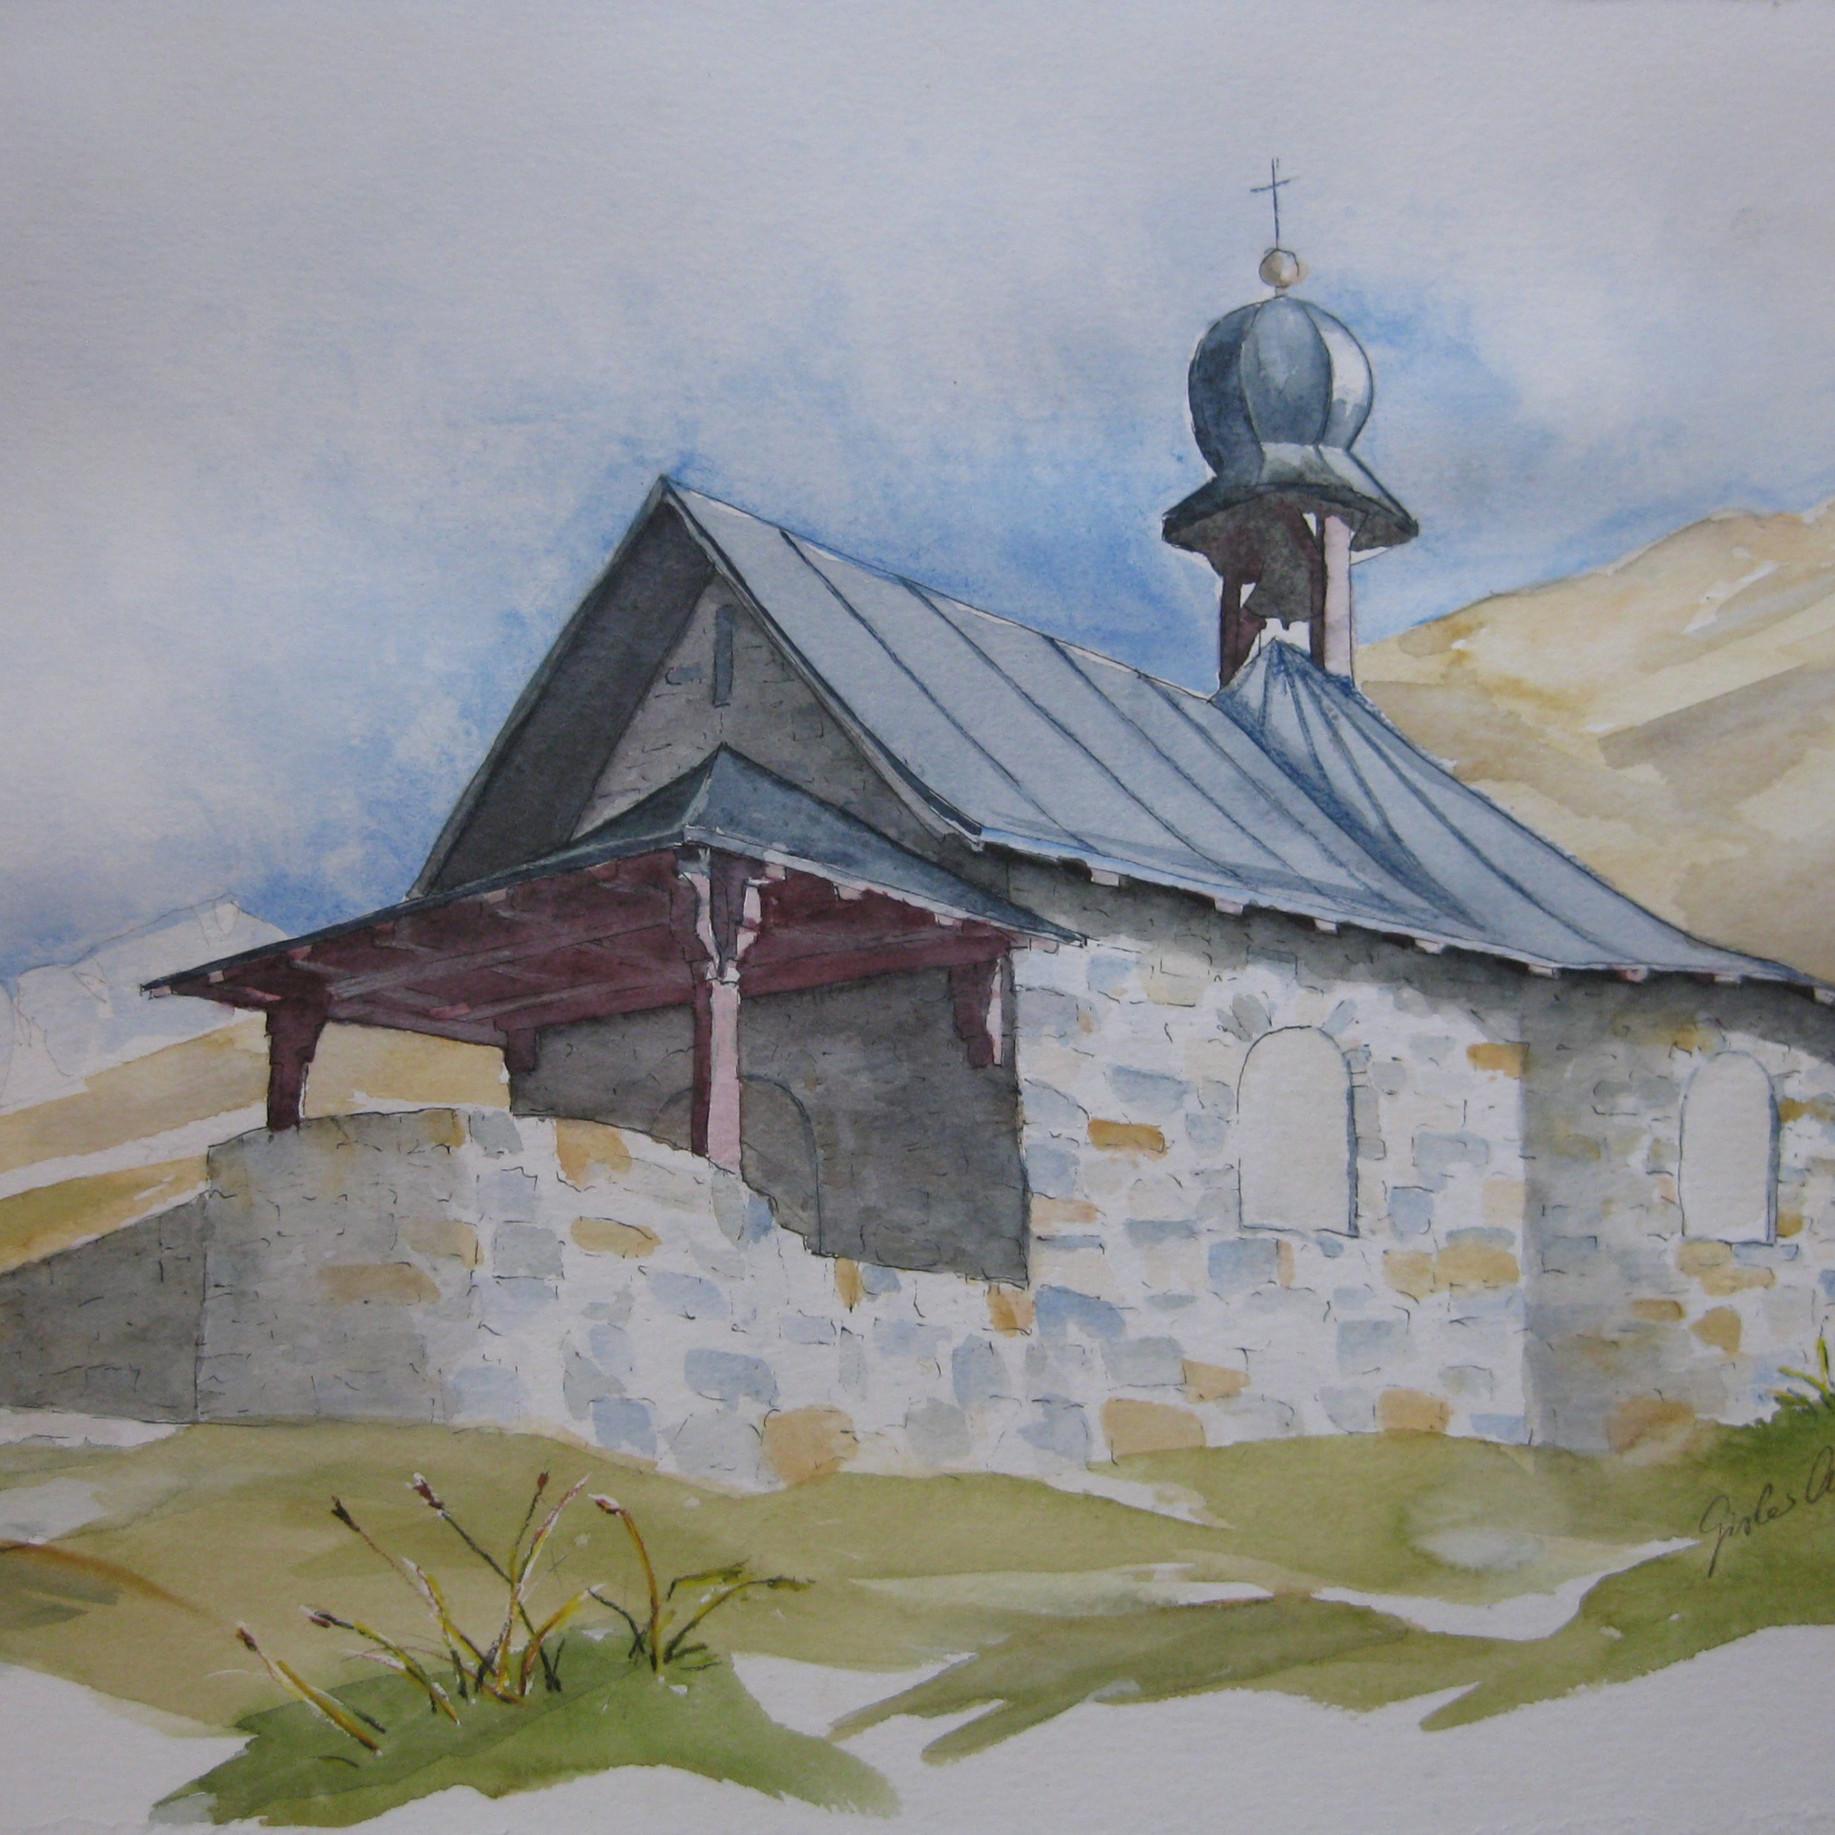 Klausenkapelle, UR                               Aquarell, 40 x 50, 2019